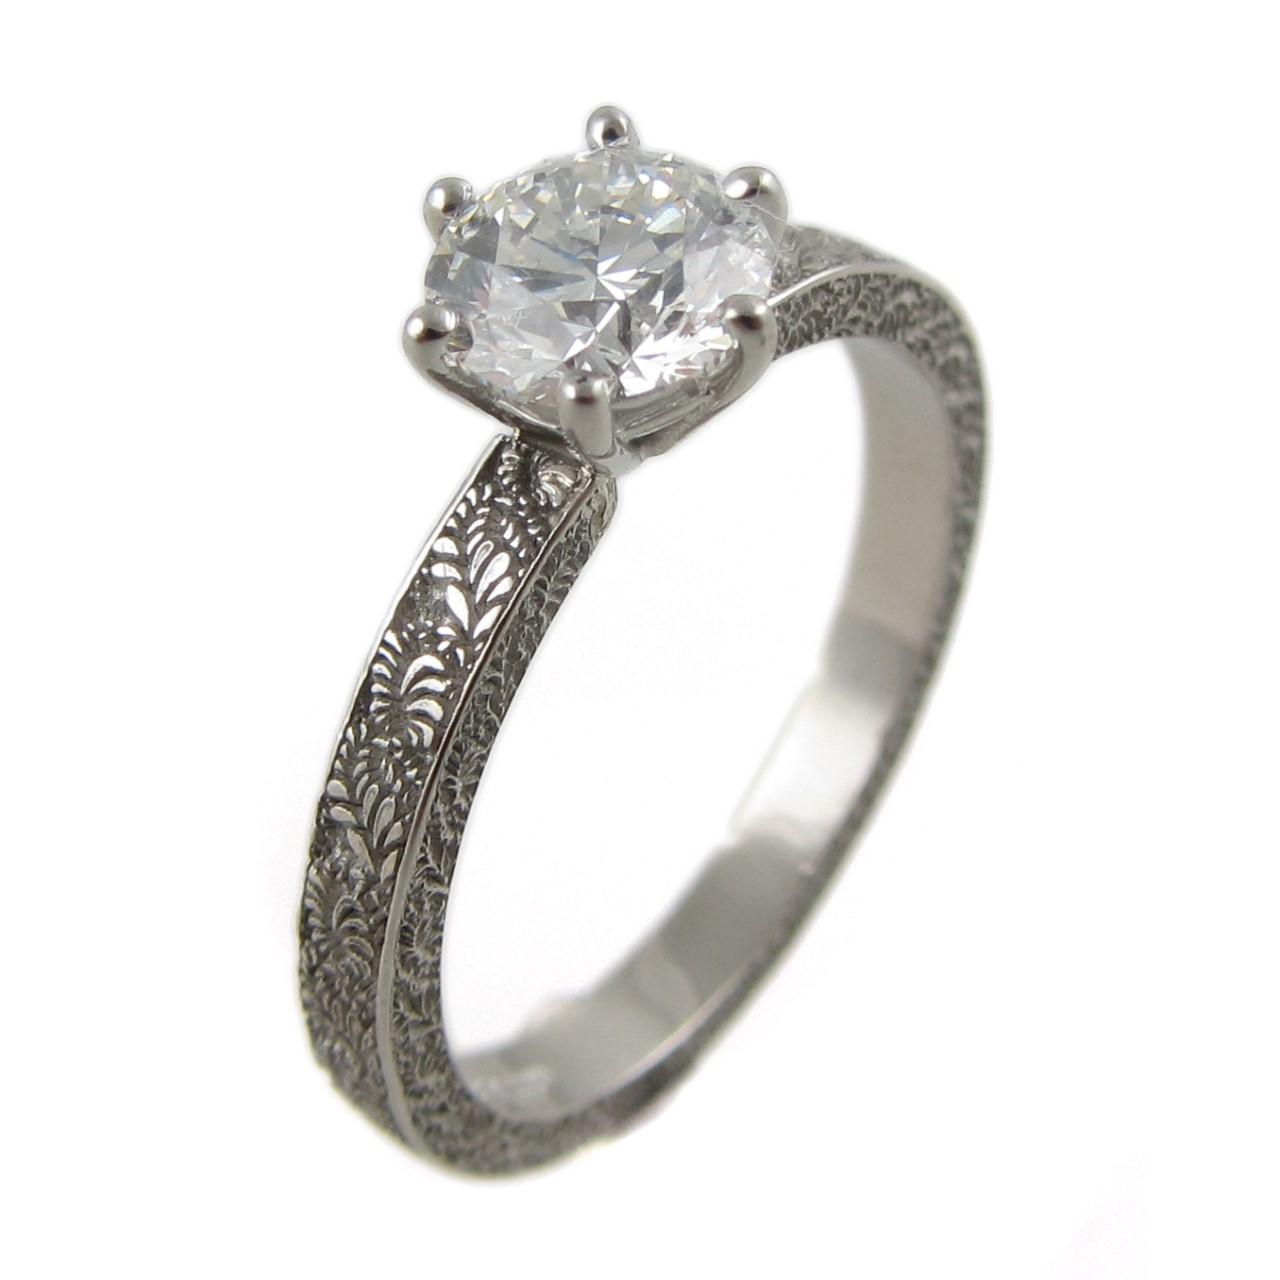 Designer Jewelry to look stunningly beautiful